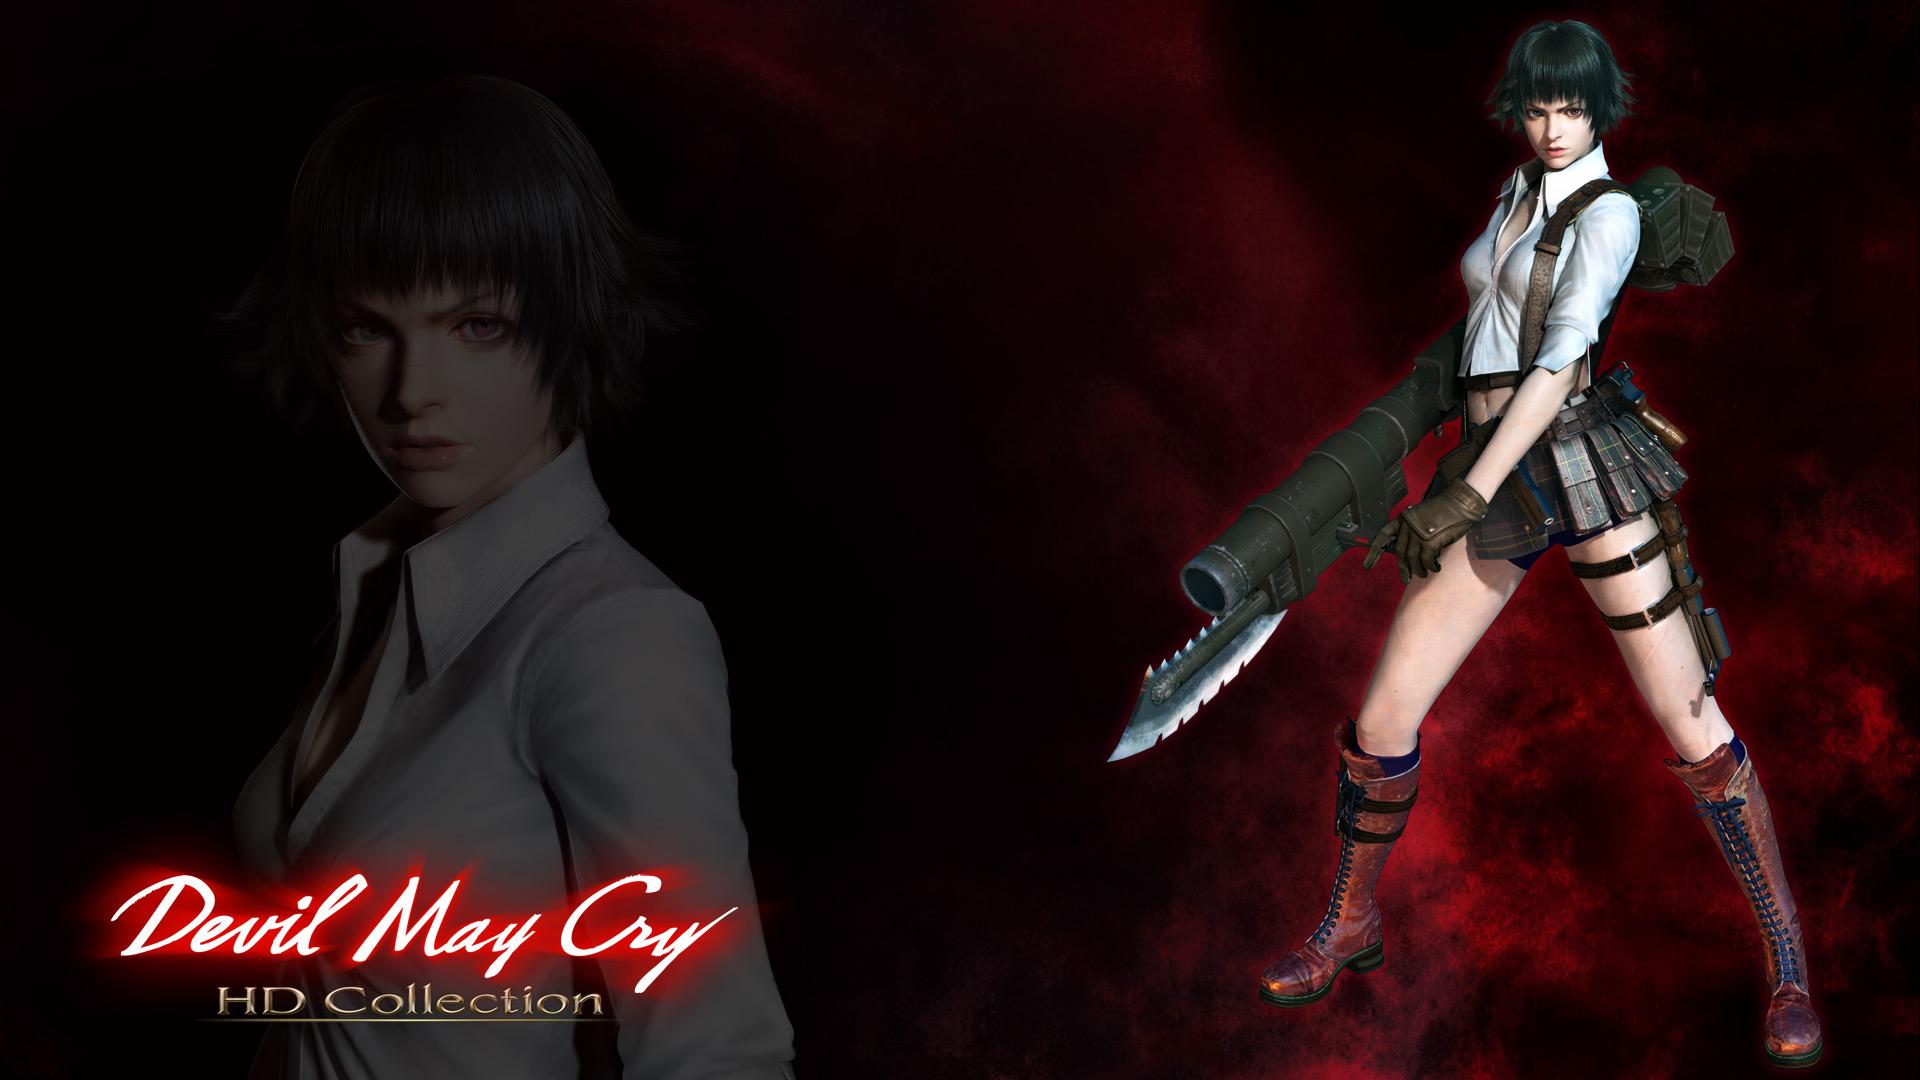 Картинки по запросу THE DEVIL MAY CRY 3 lady